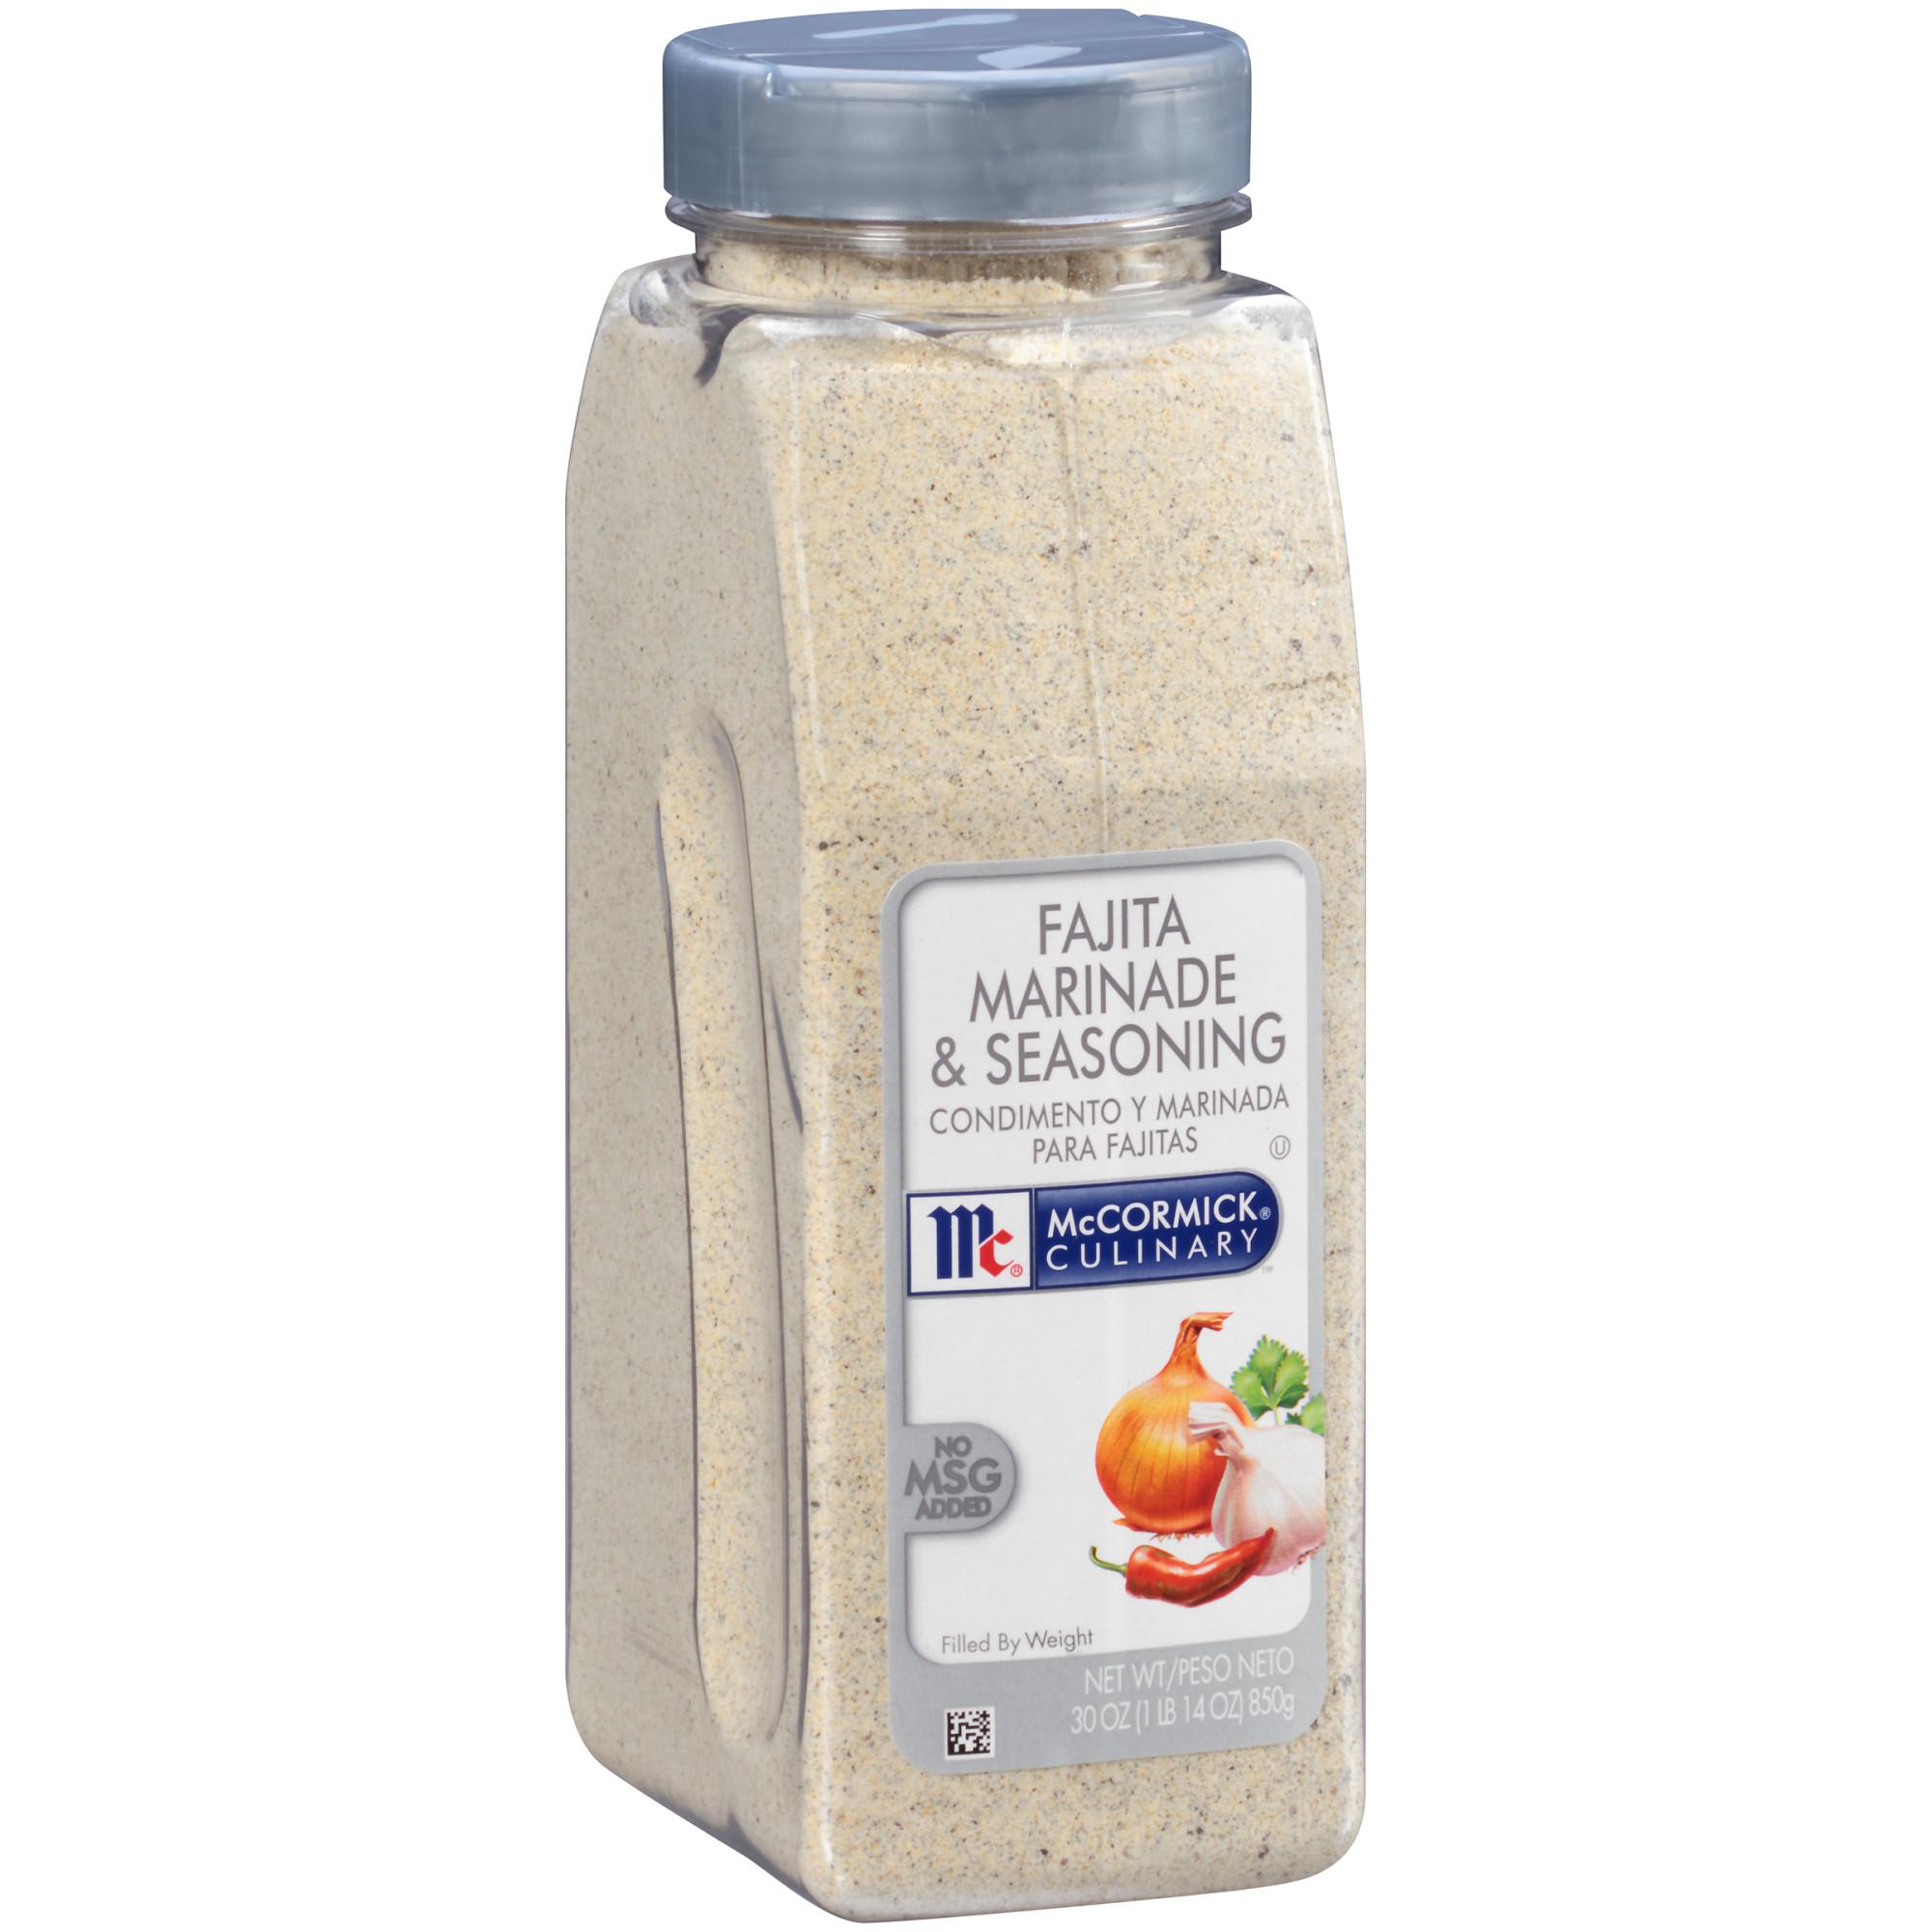 McCormick Culinary Fajita Marinade & Seasoning Mix, 30 oz